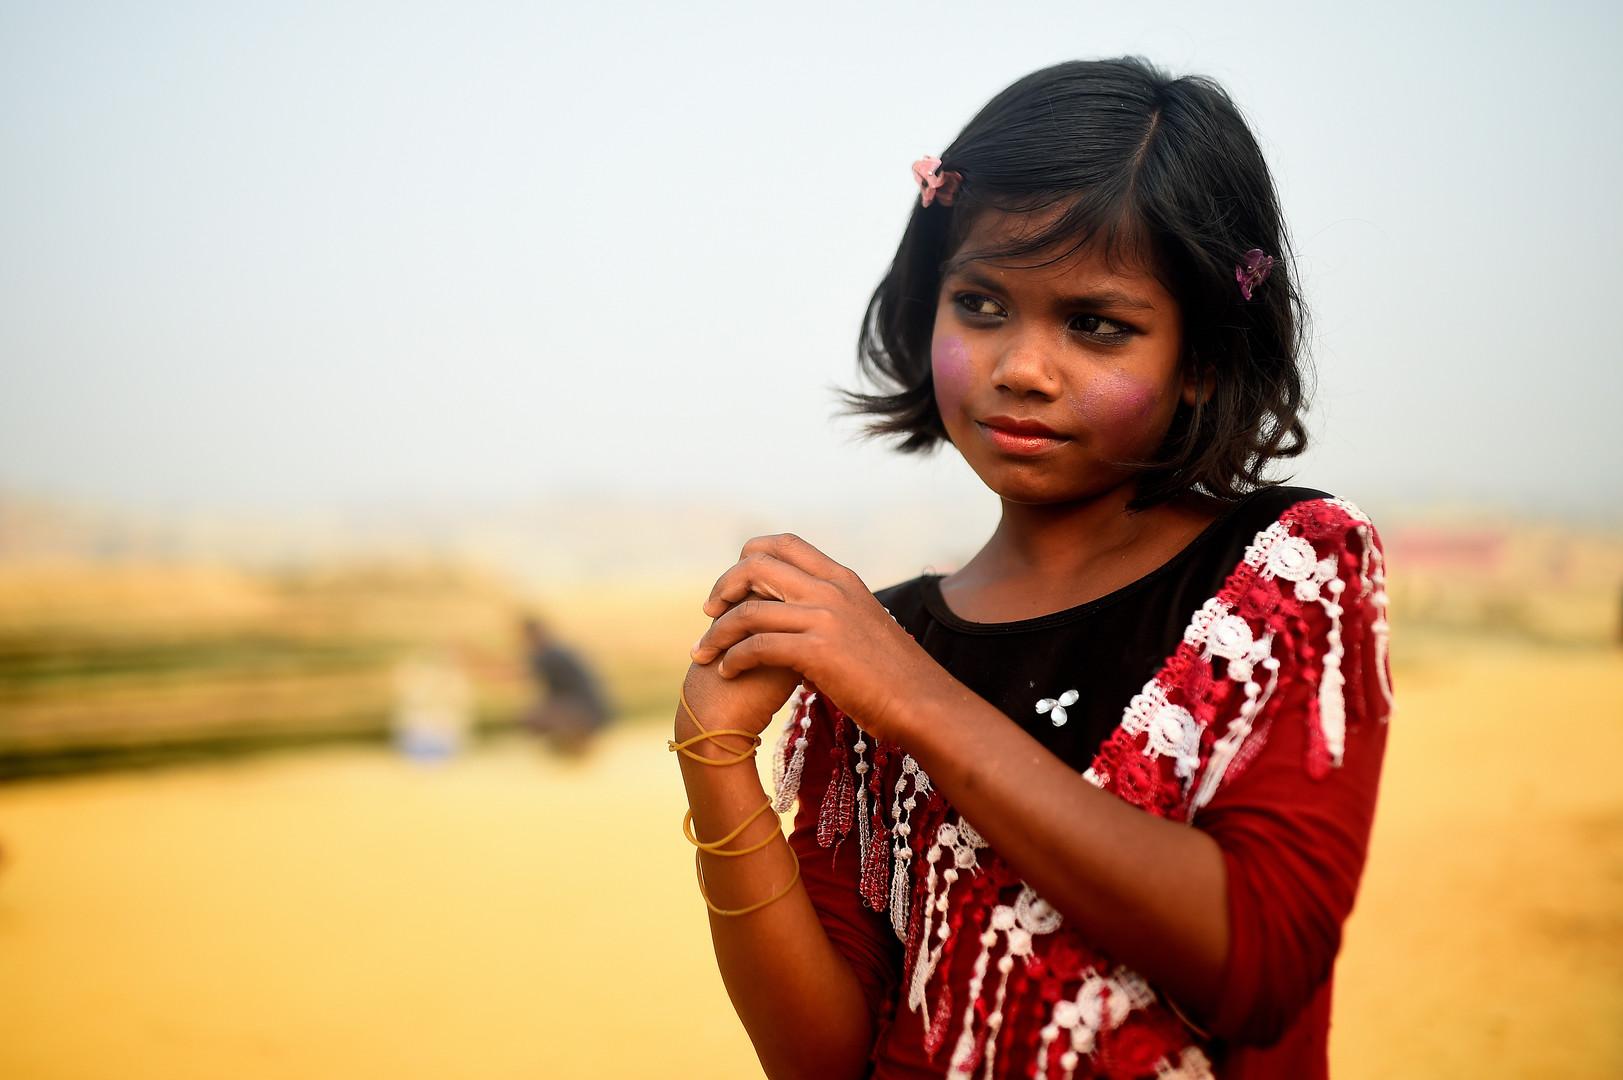 Dil Kayas, 10 Jahre alt, Kutupalong Flüchtlingscamp, Cox Bazar, Bangladesch, 3. April 2018.